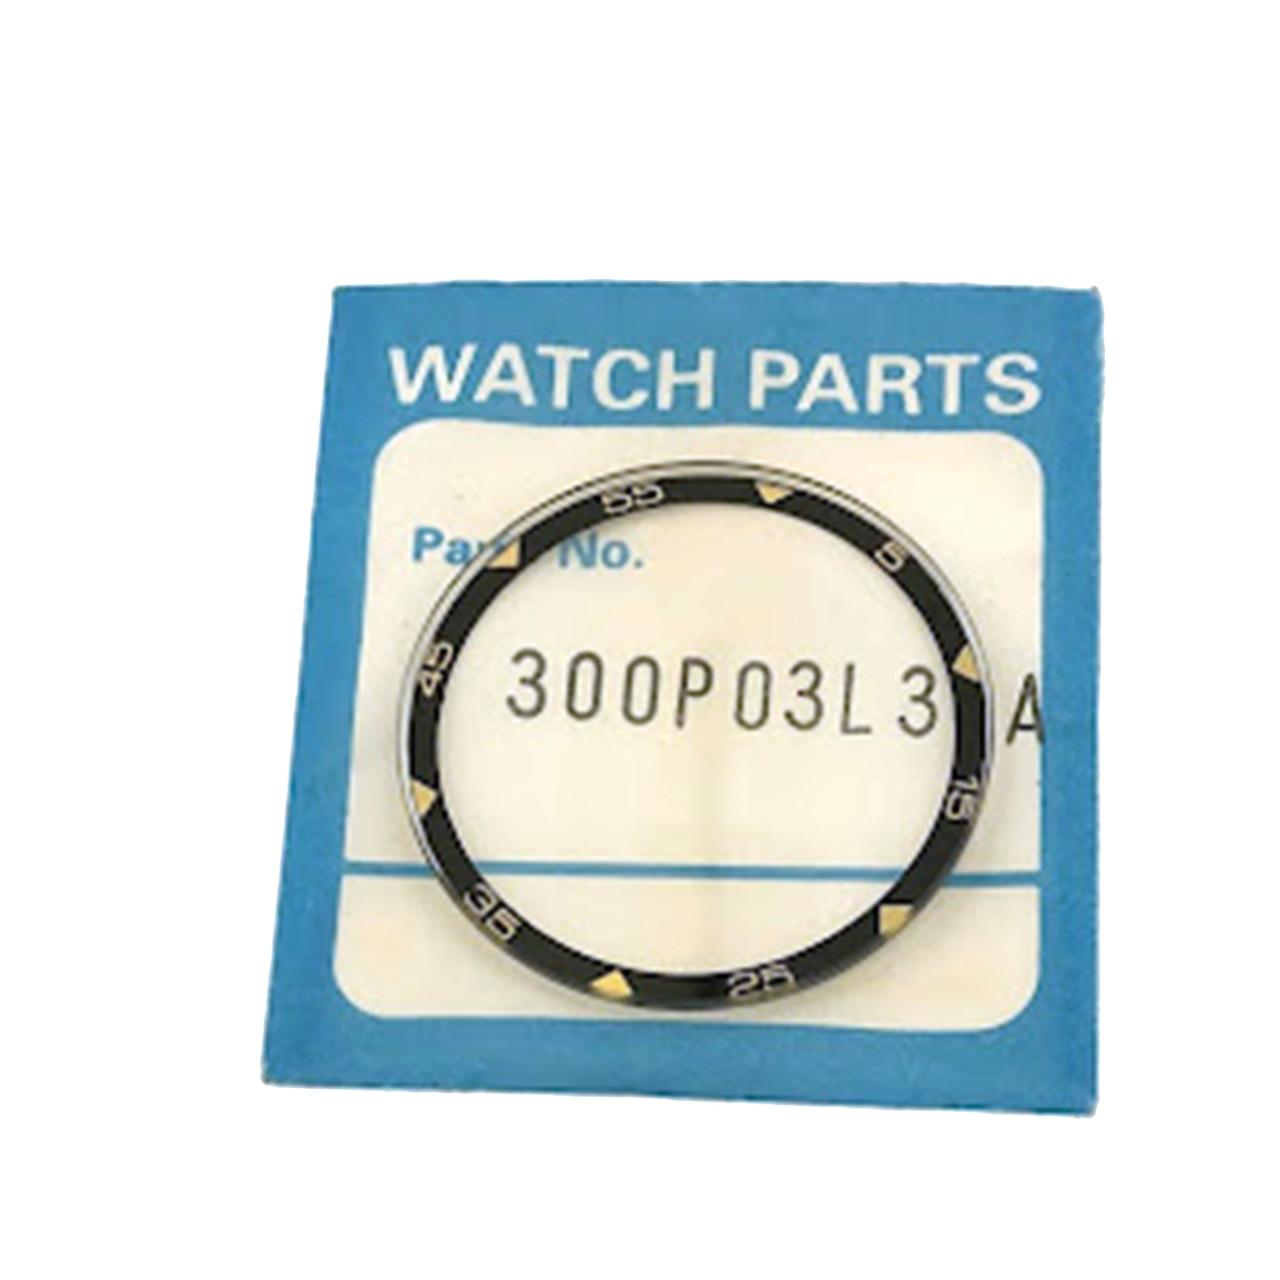 Seiko 300P03L30A 7N43-7098